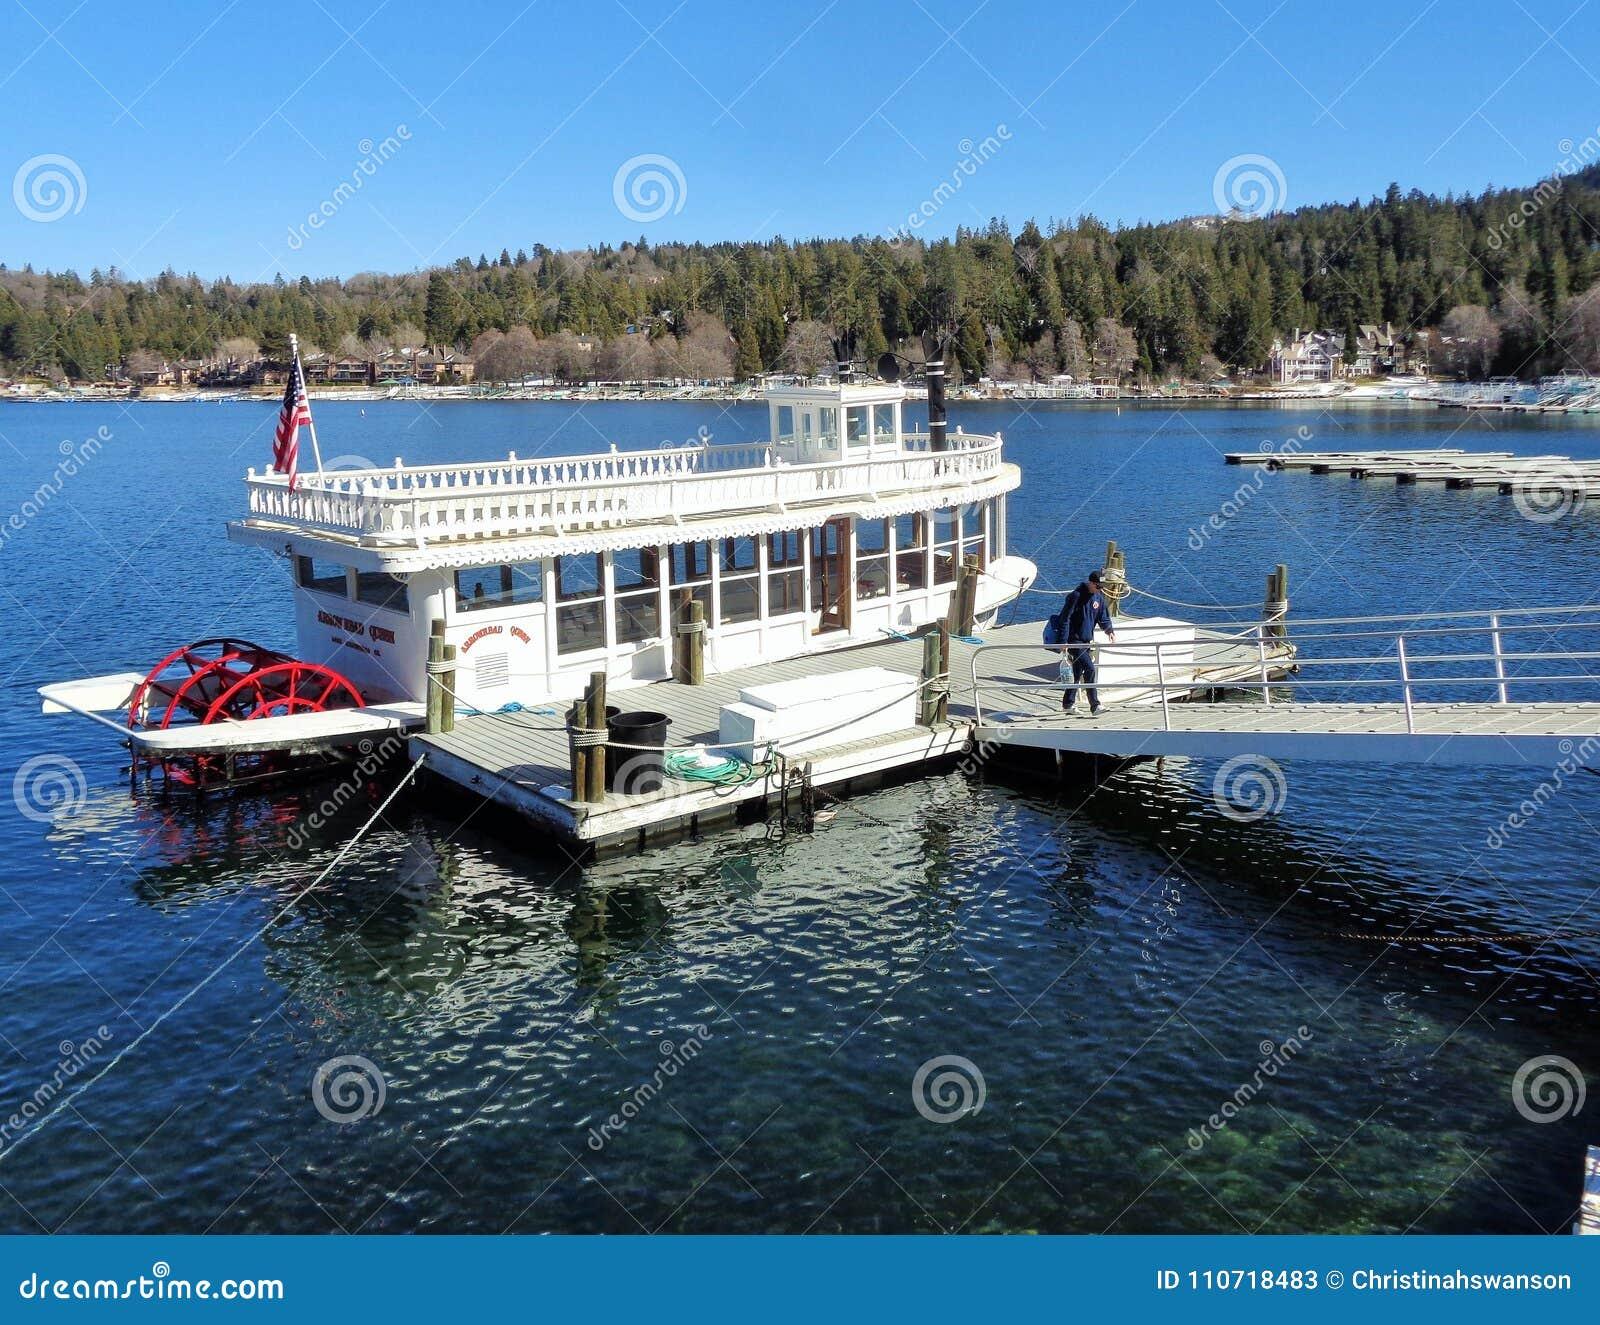 Arrowhead λιμνών βασίλισσα Paddle-wheel Boat στην αποβάθρα